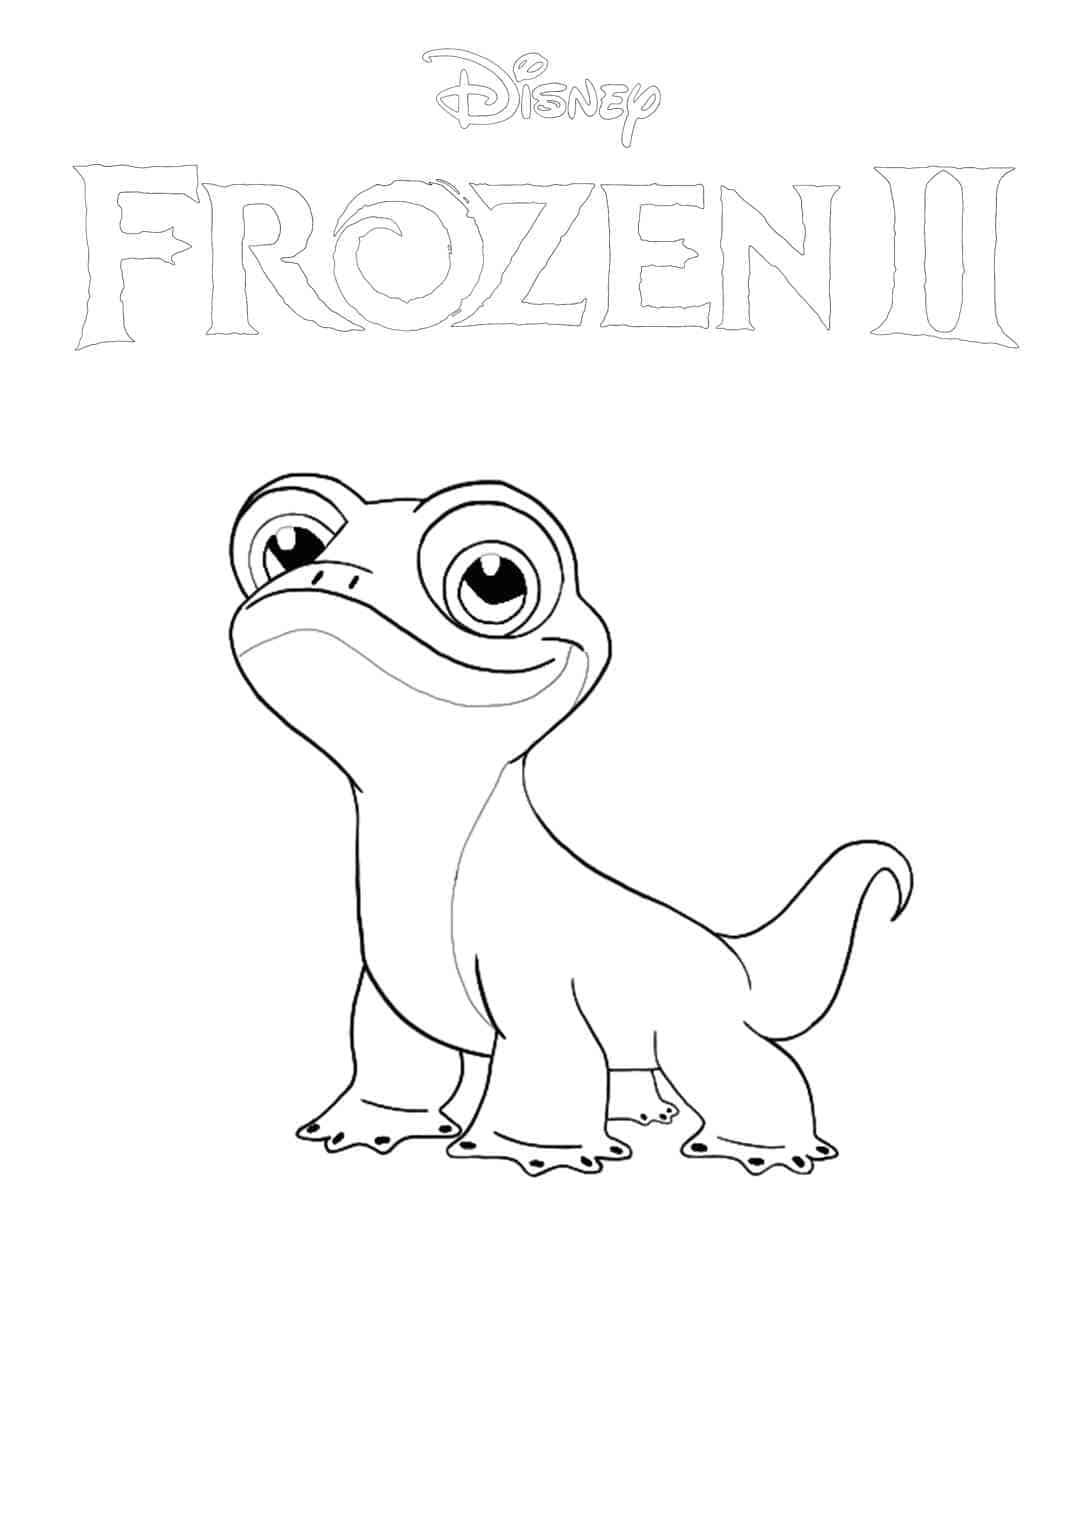 Dessin Reine Des Neiges 2 : dessin, reine, neiges, Coloriage, Bruni, Coloriages, Reine, Neiges, (Frozen